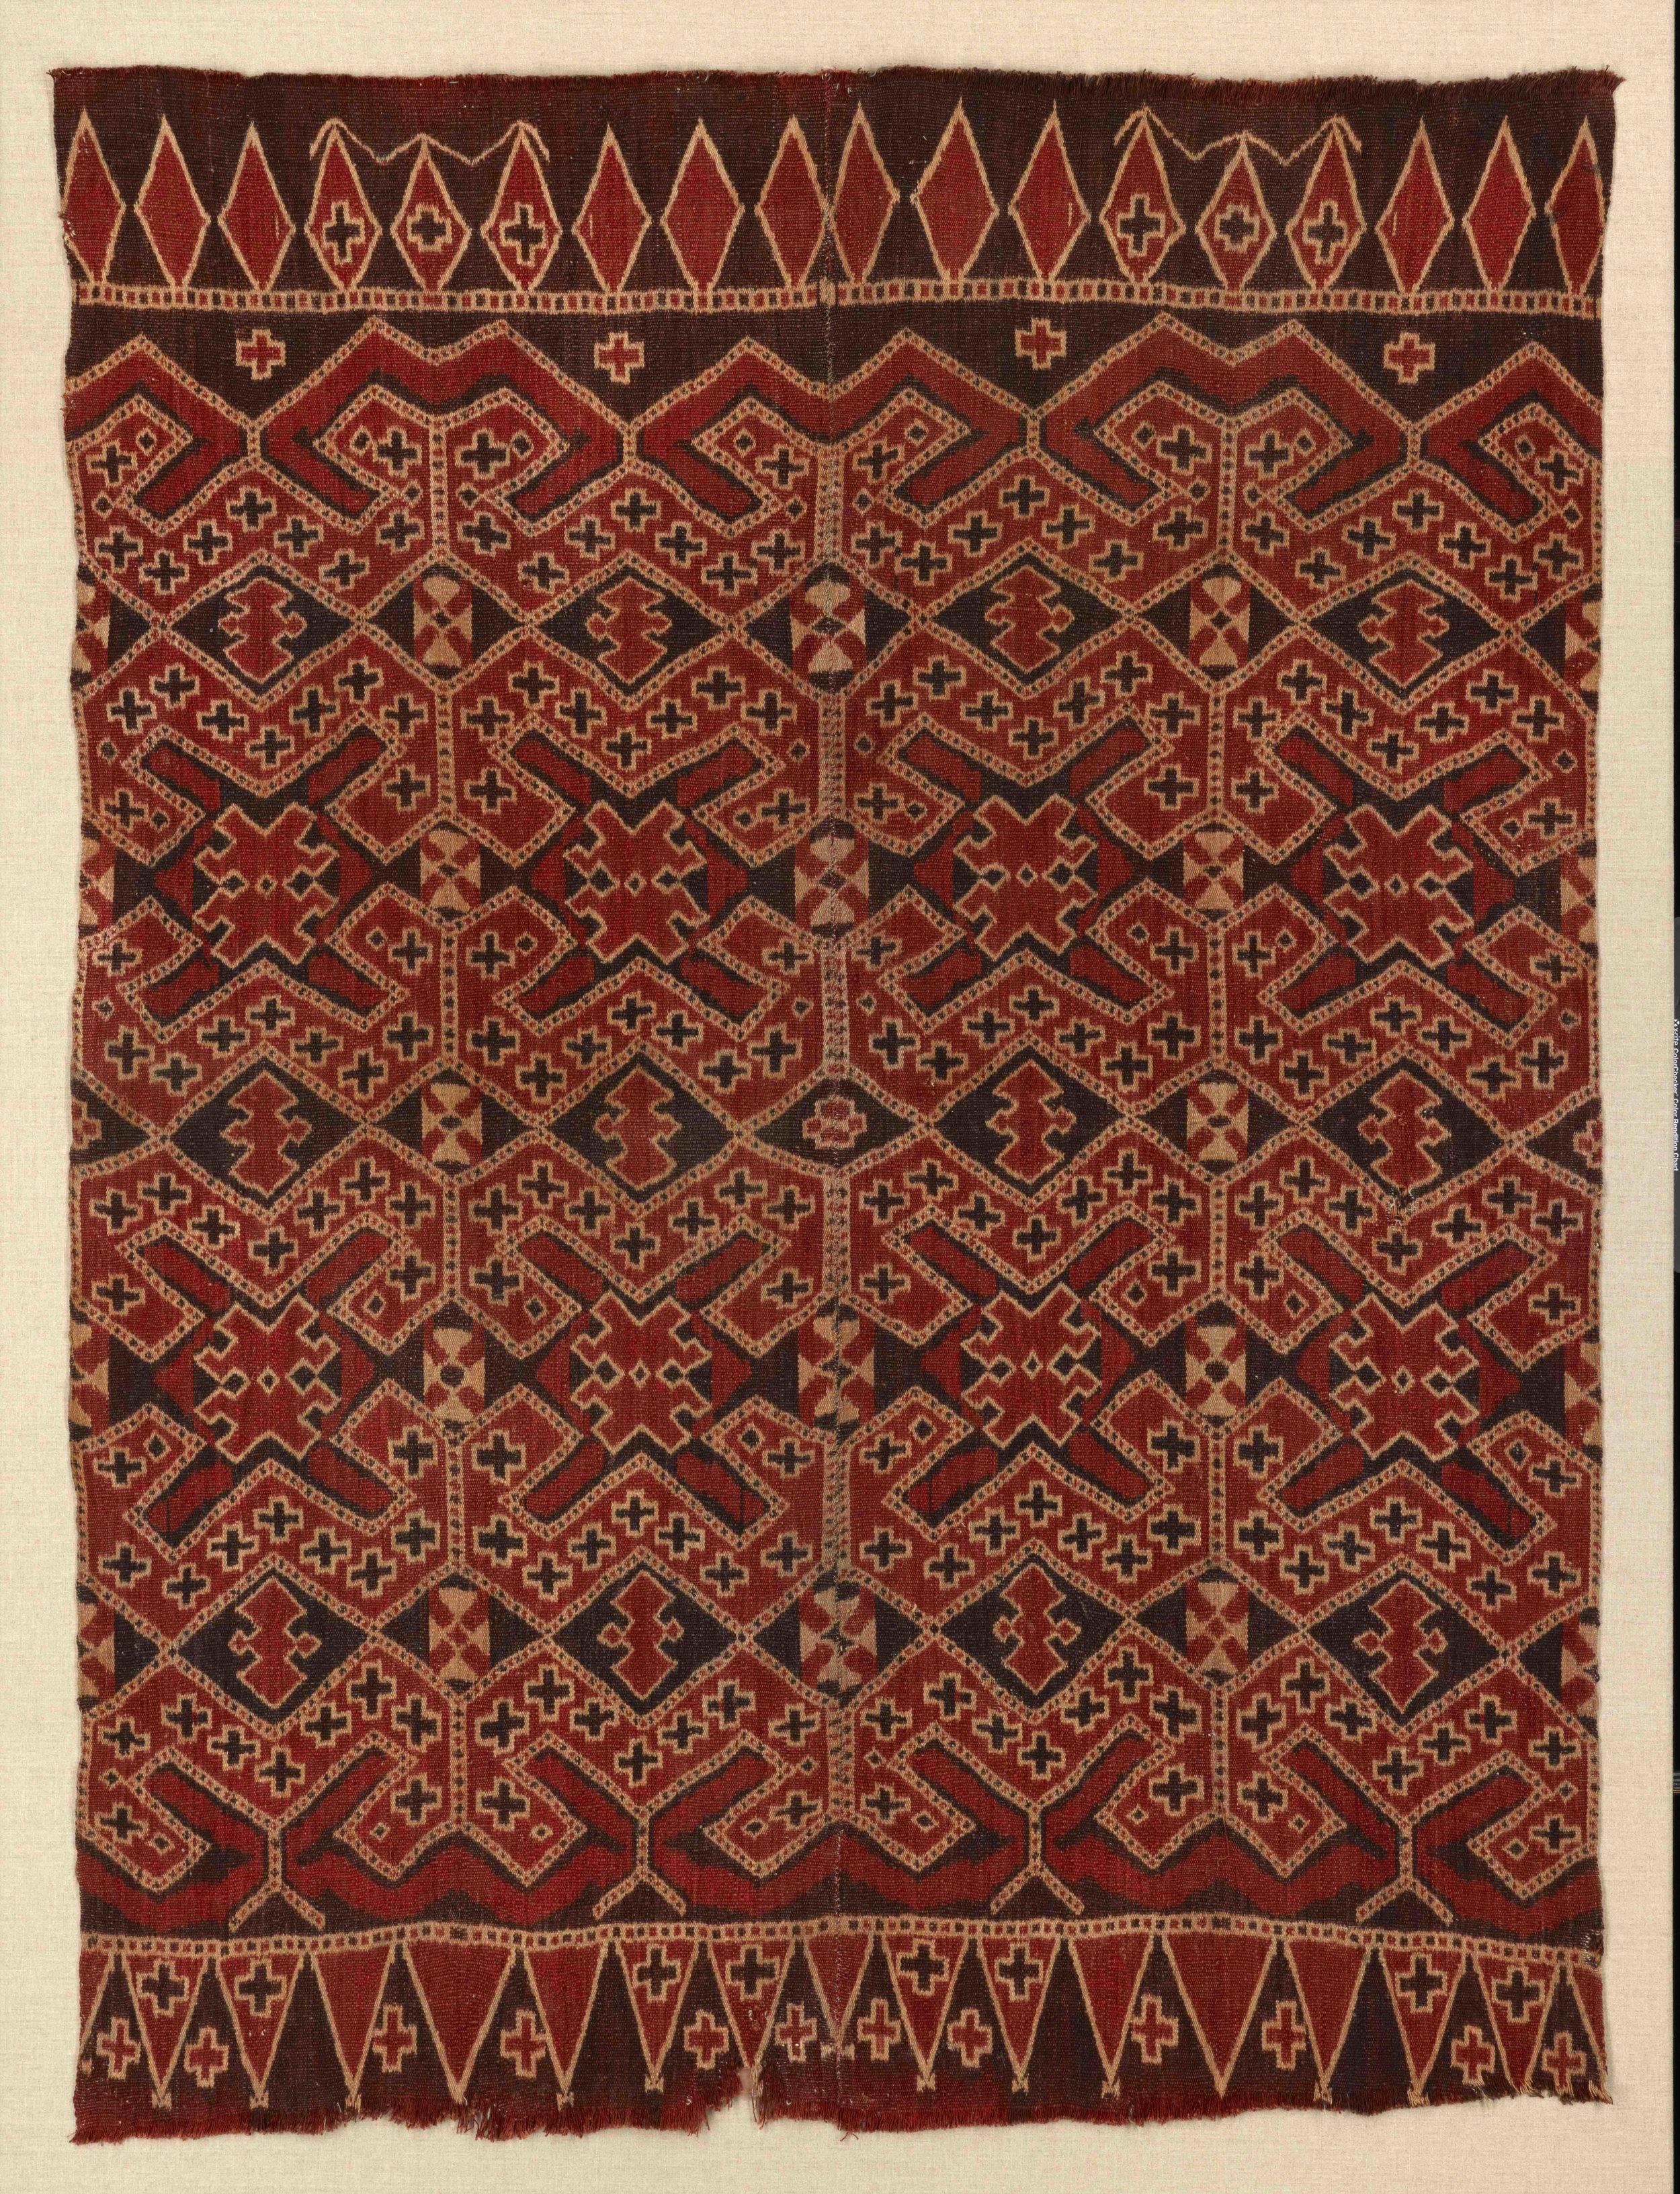 Shroud or Ceremonial Hanging | Papori To Noling © Dallas Museum of Art | Texas, USA